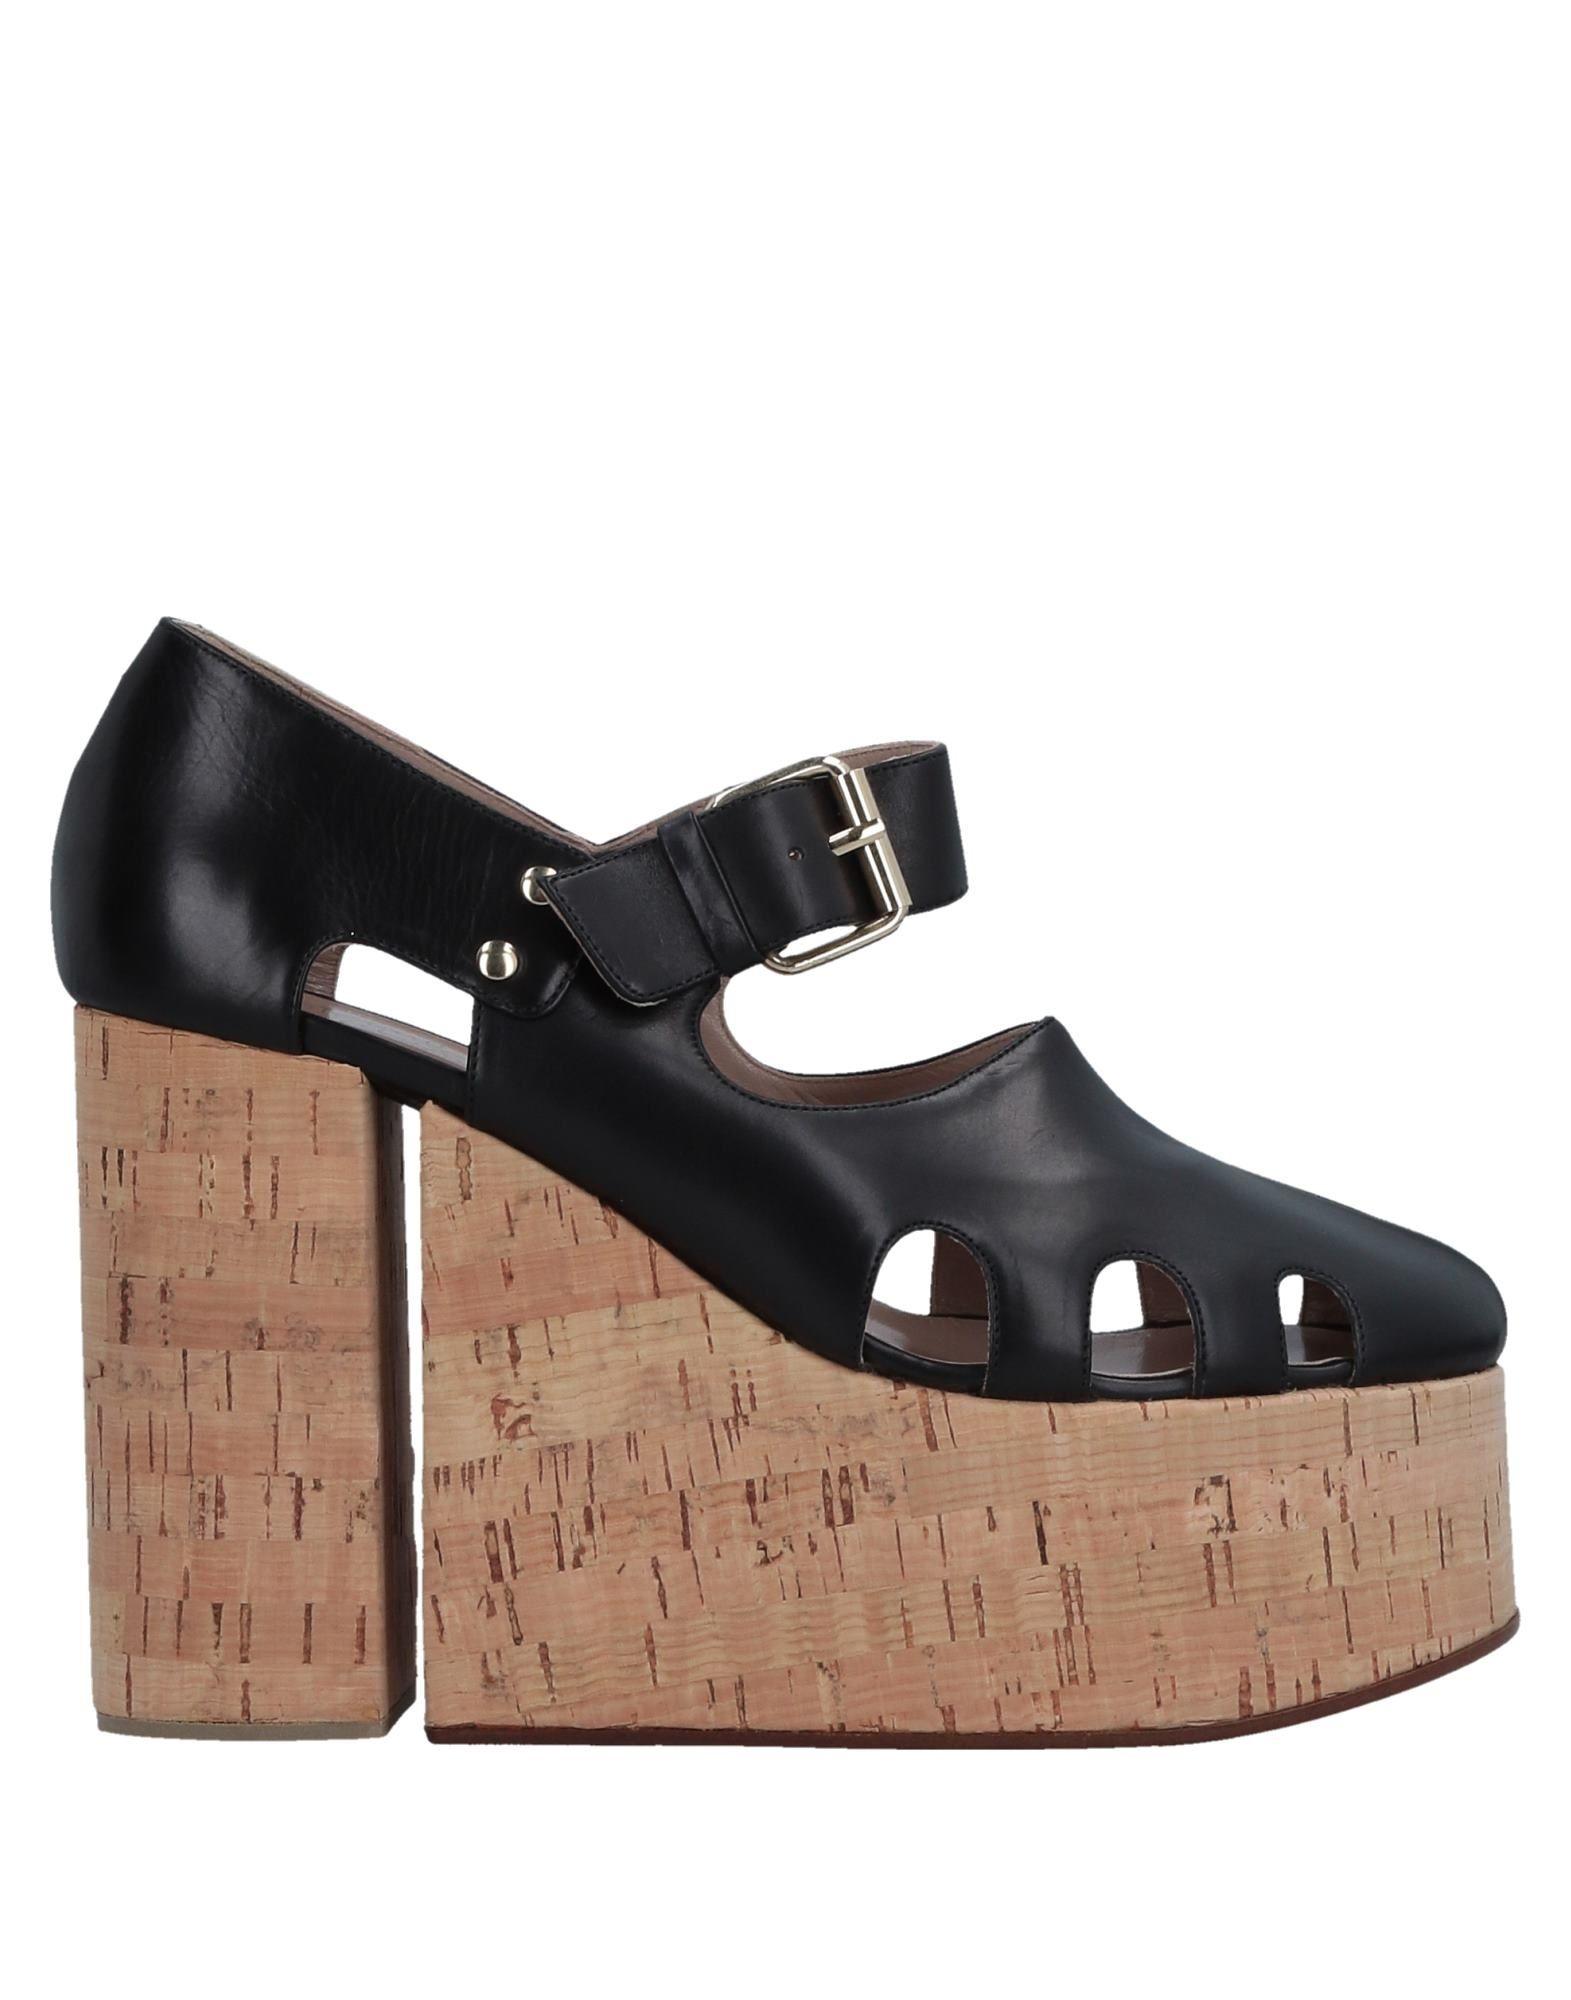 Vivienne Westwood Sandals - Women on Vivienne Westwood Sandals online on Women  United Kingdom - 11521605WC ab9b46